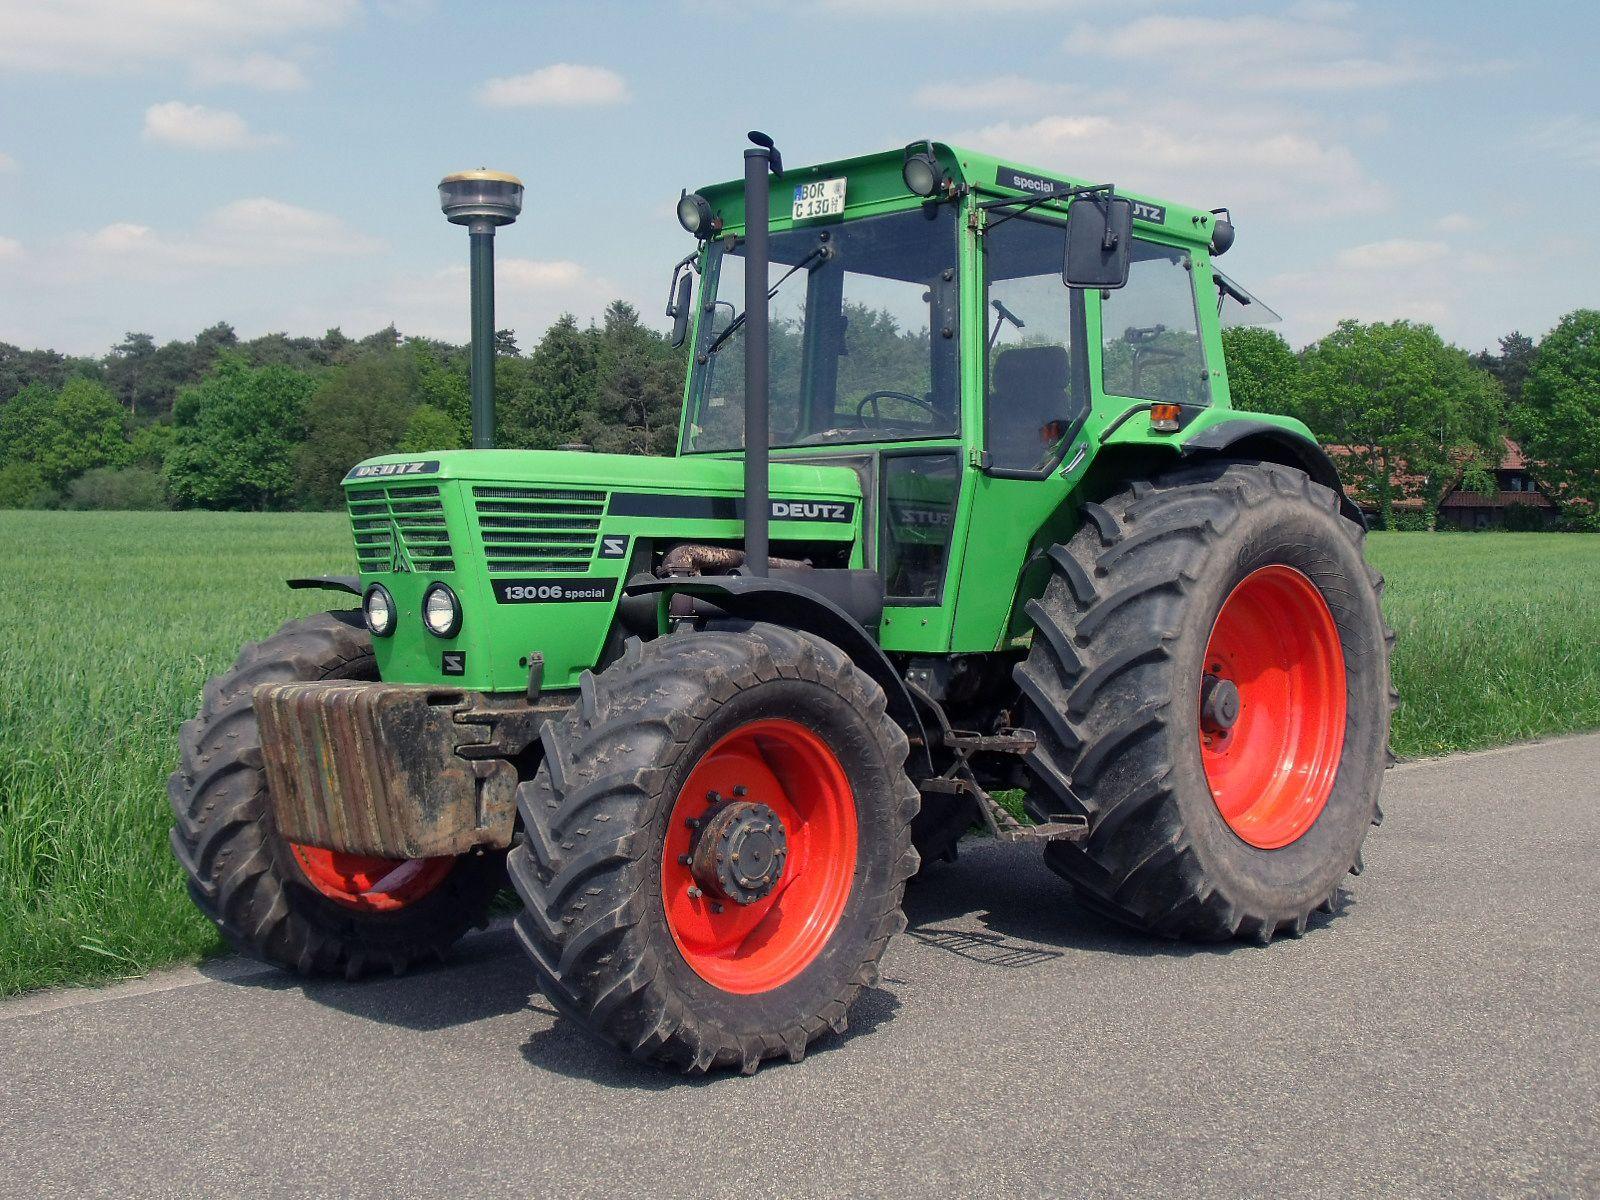 deutz 13006 special �� tractor mania �� pinterest